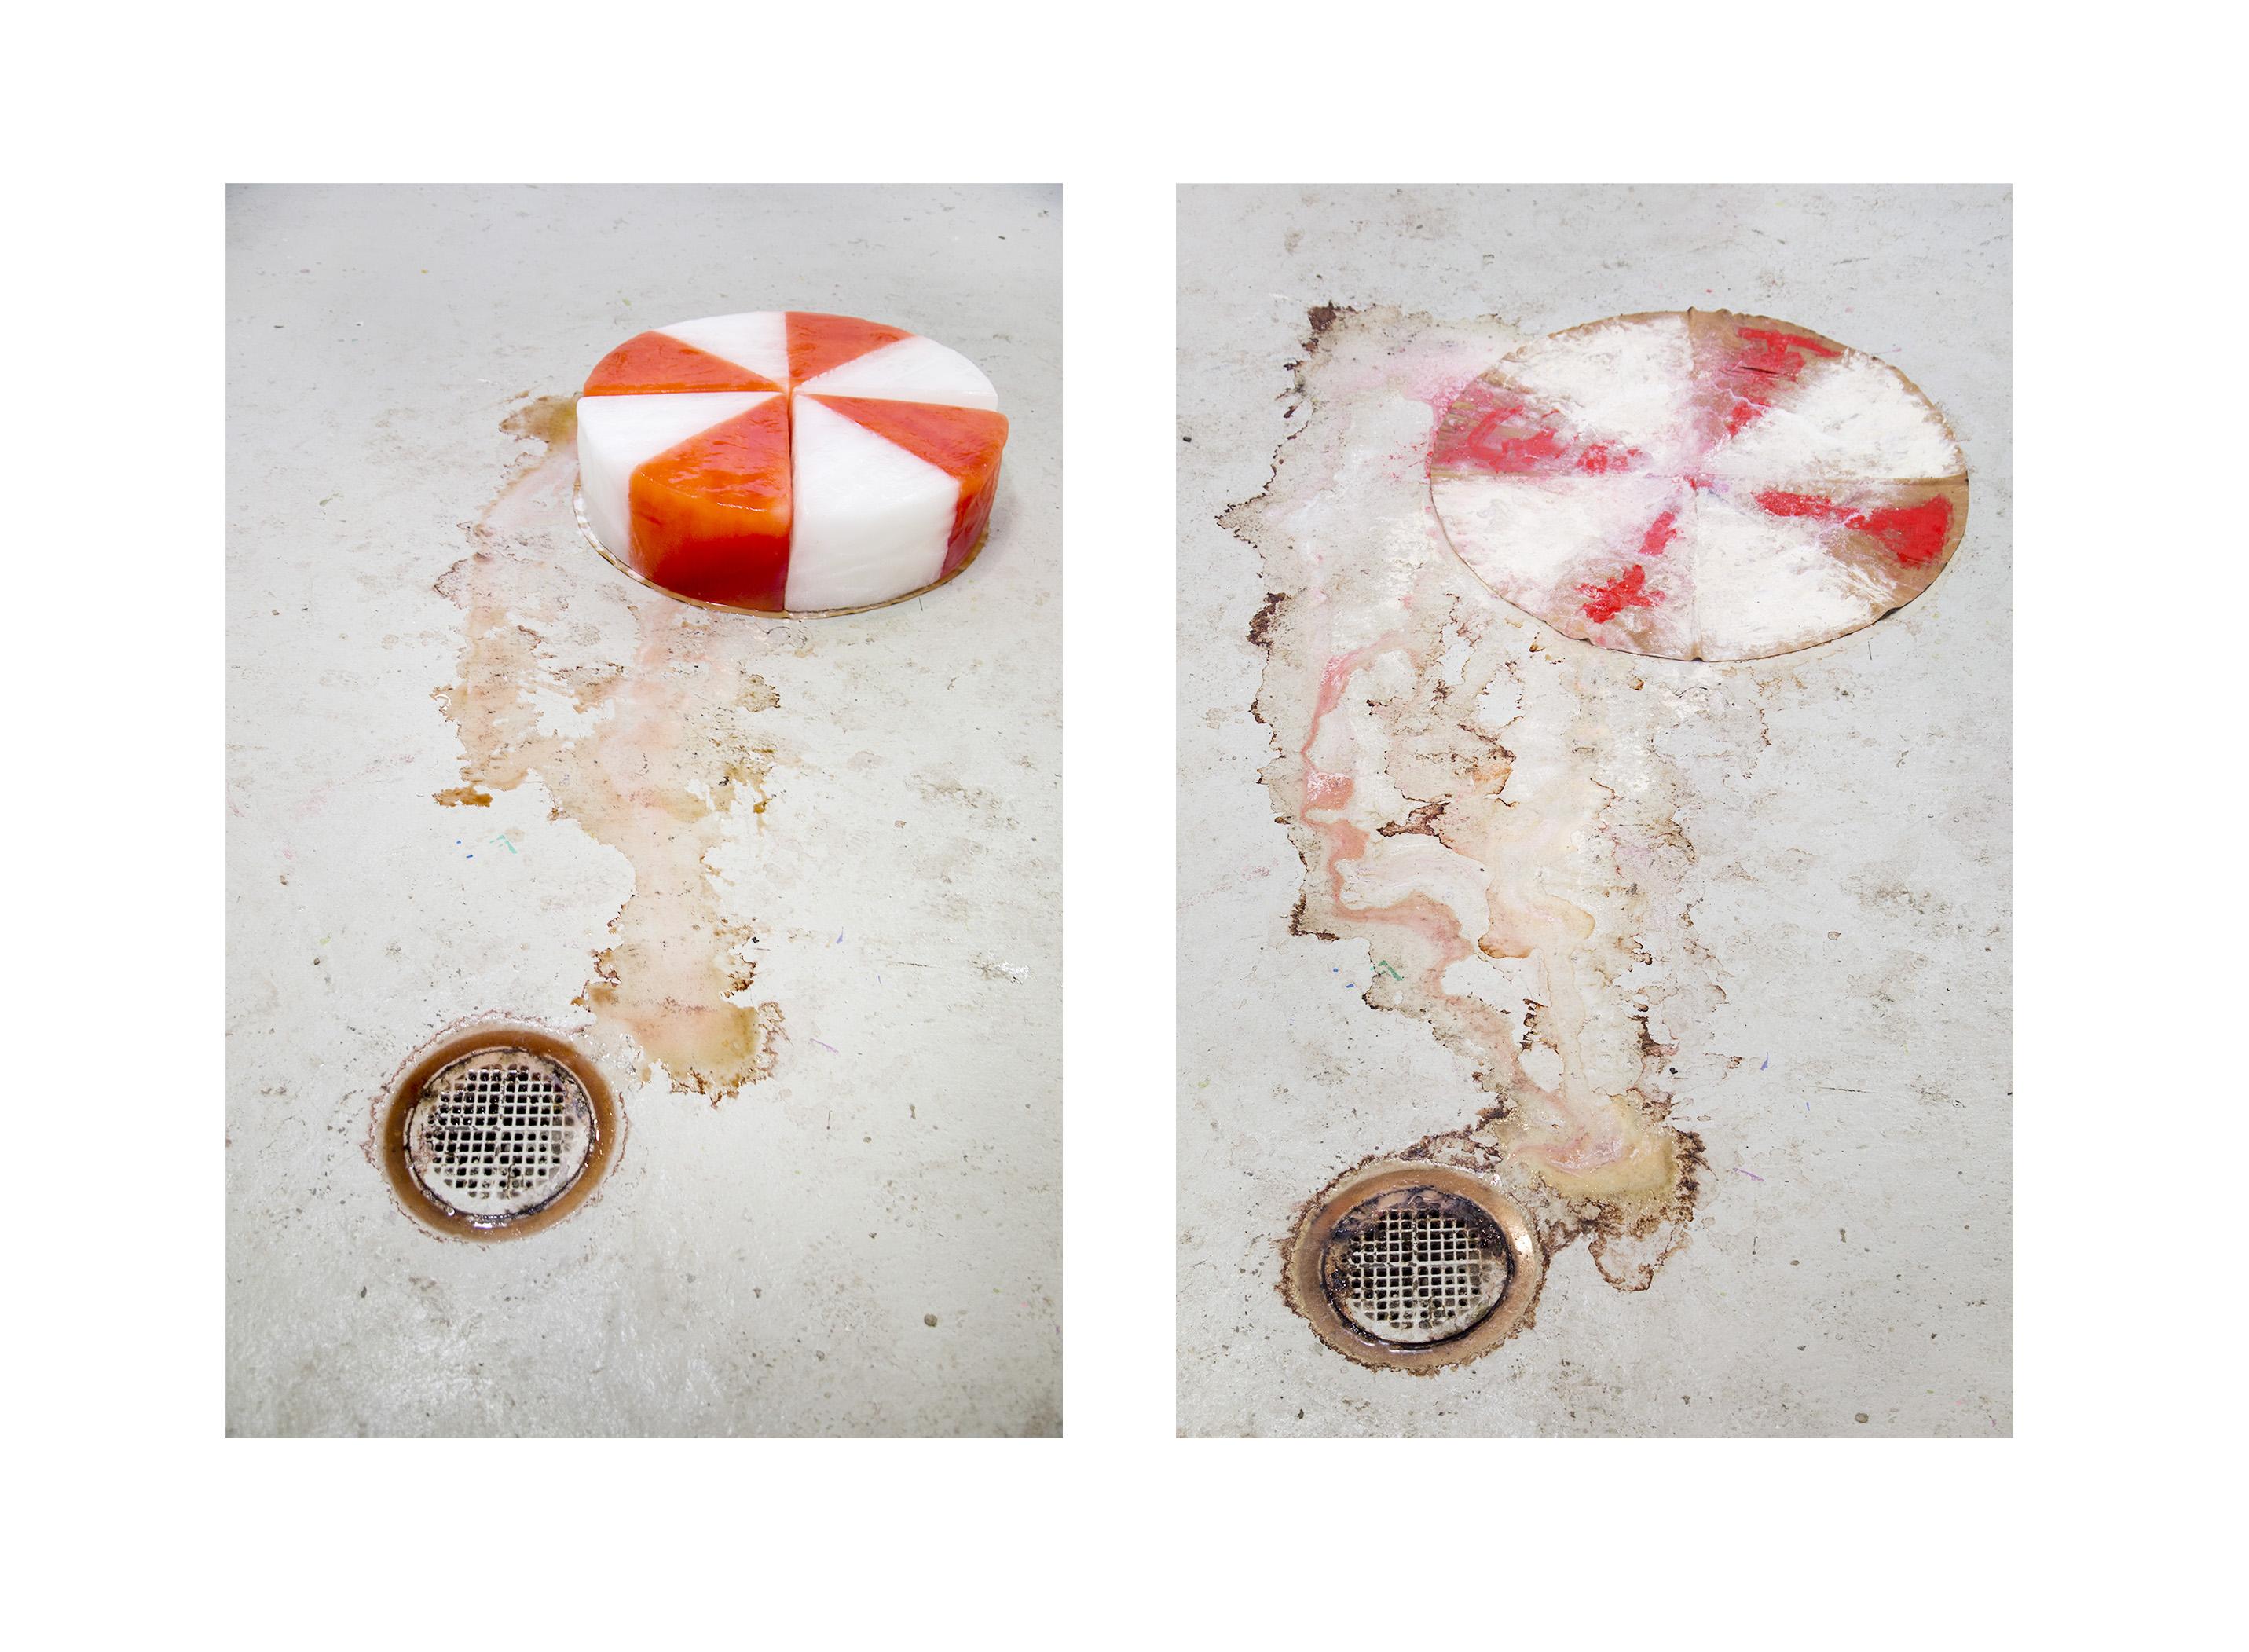 Is på kohud, 2016 (ice, hide and pigment), image from the exhibition HUR MYCKET VÄGER ETT BERG at Hangmen Projects, Stockholm